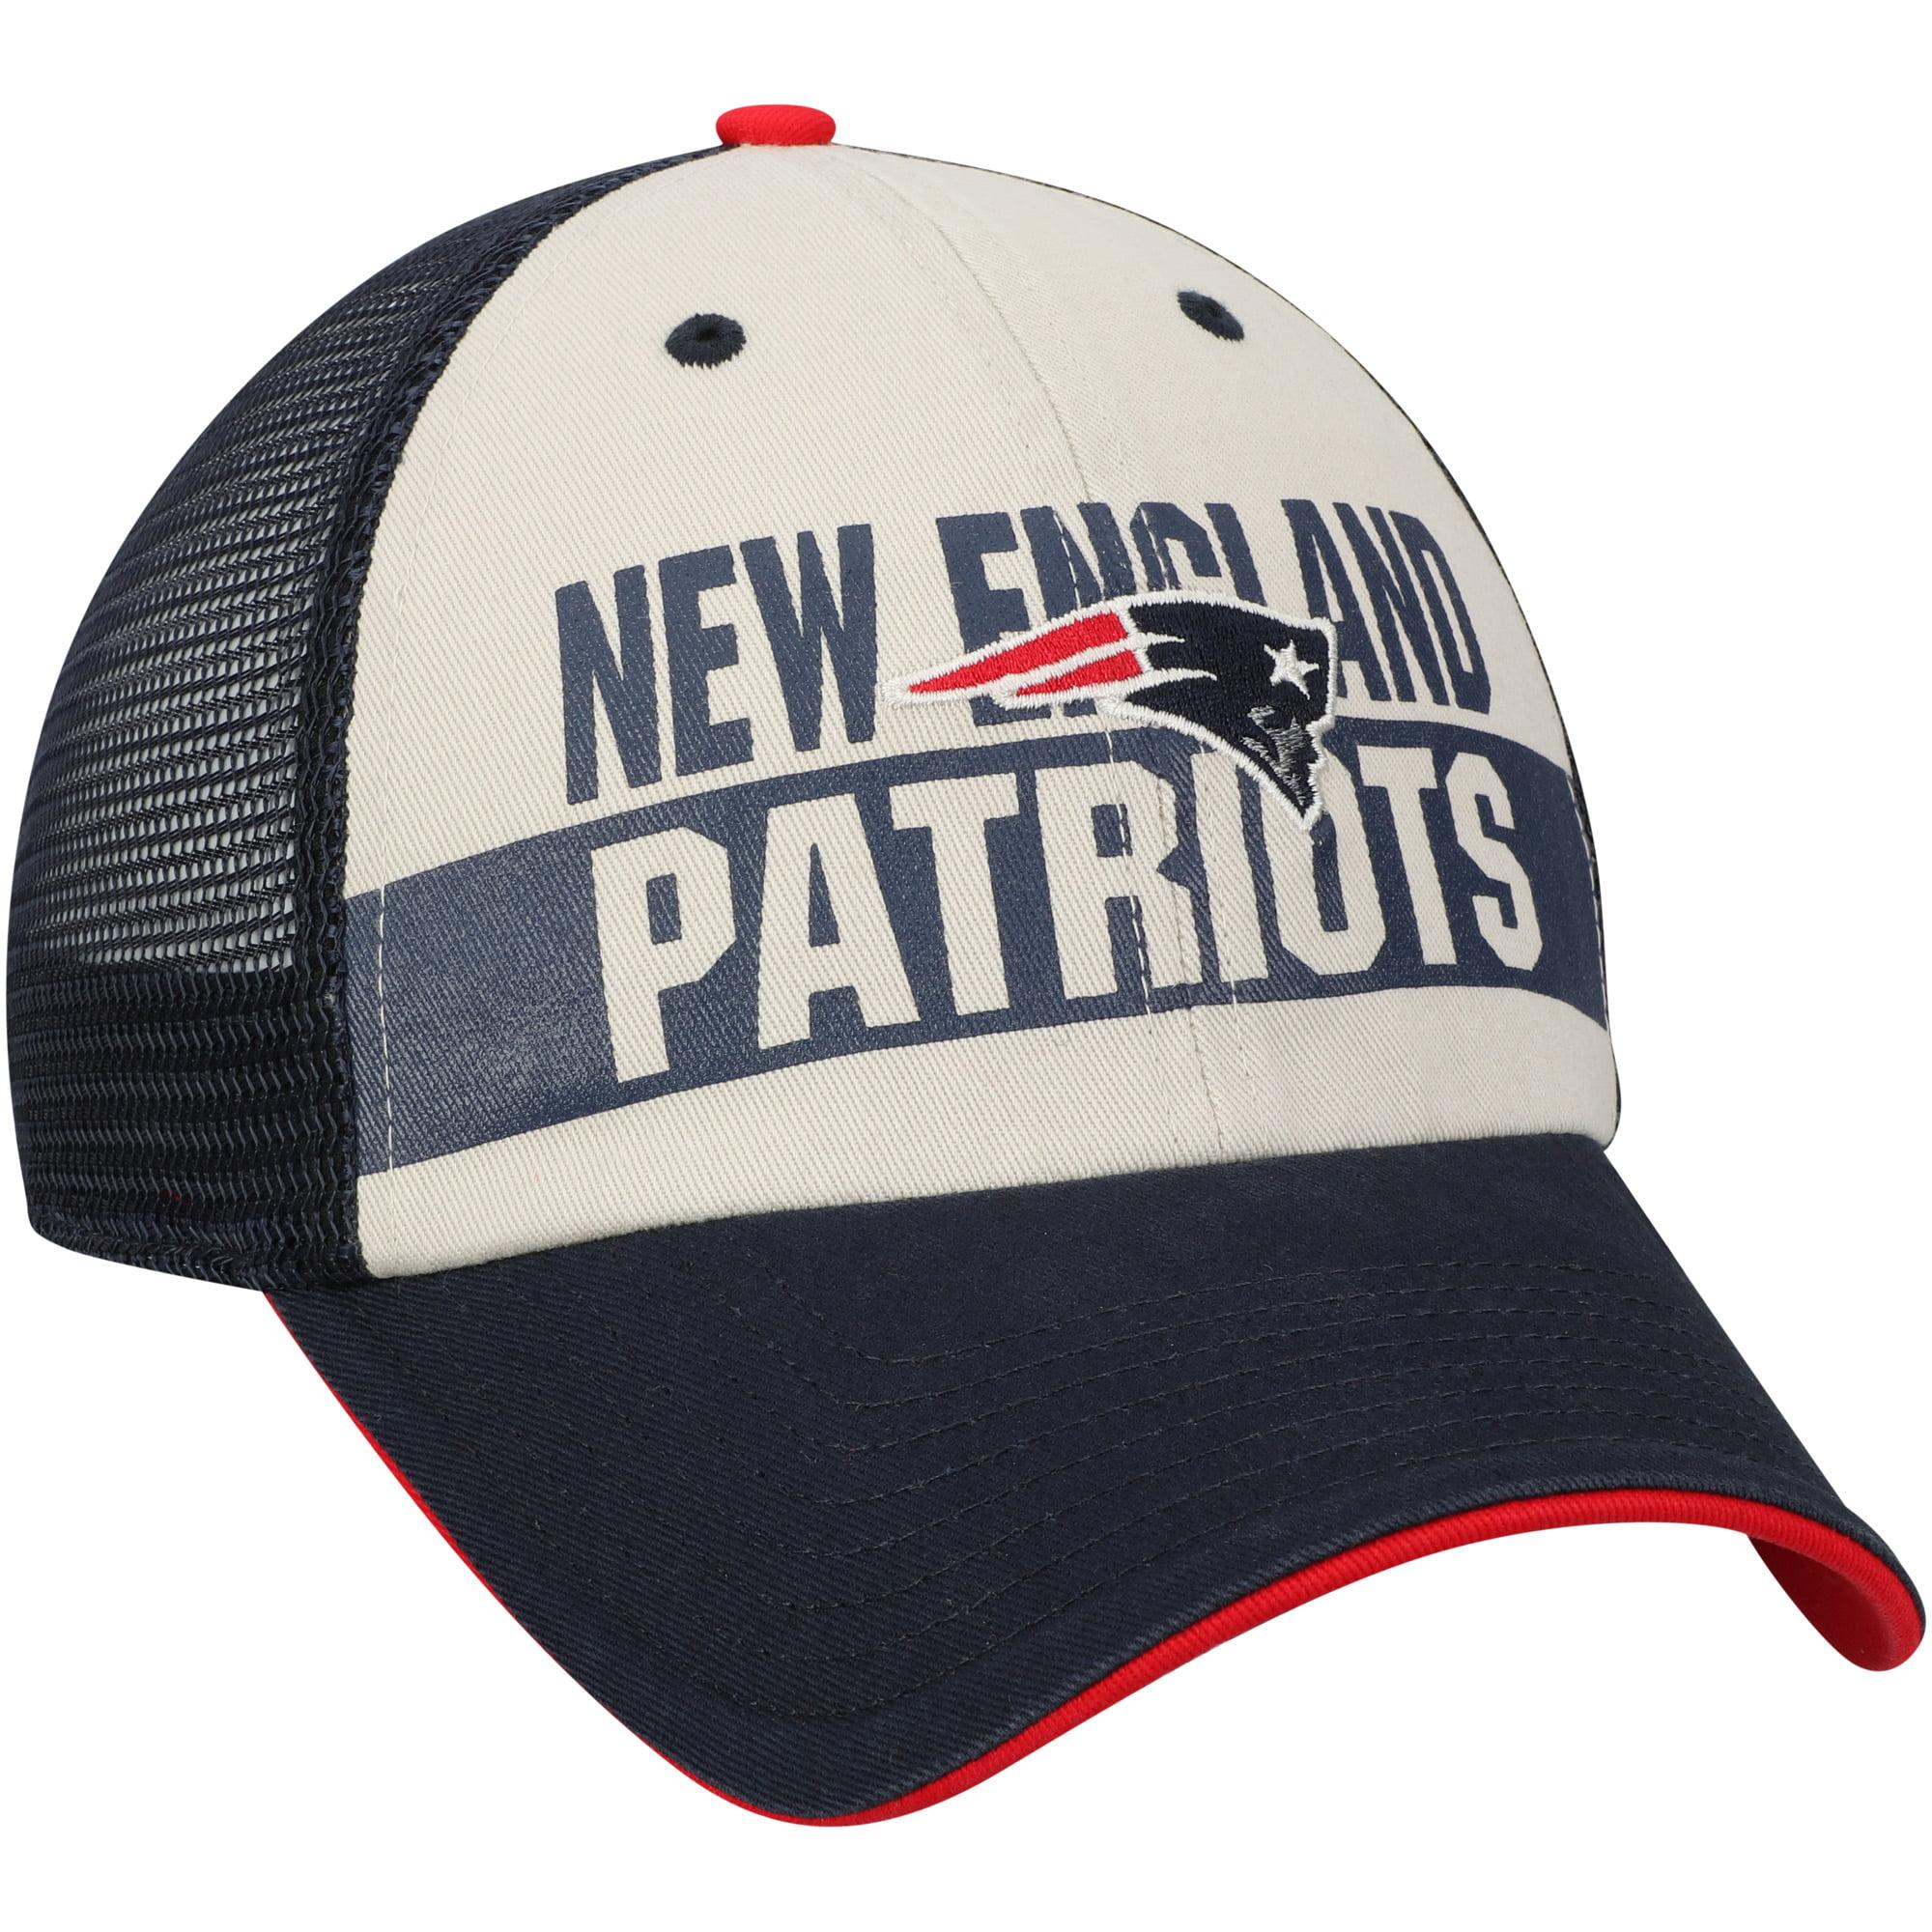 39958c390 Men s Fan Favorite Navy New England Patriots Glover Snapback Hat - OSFA -  Walmart.com